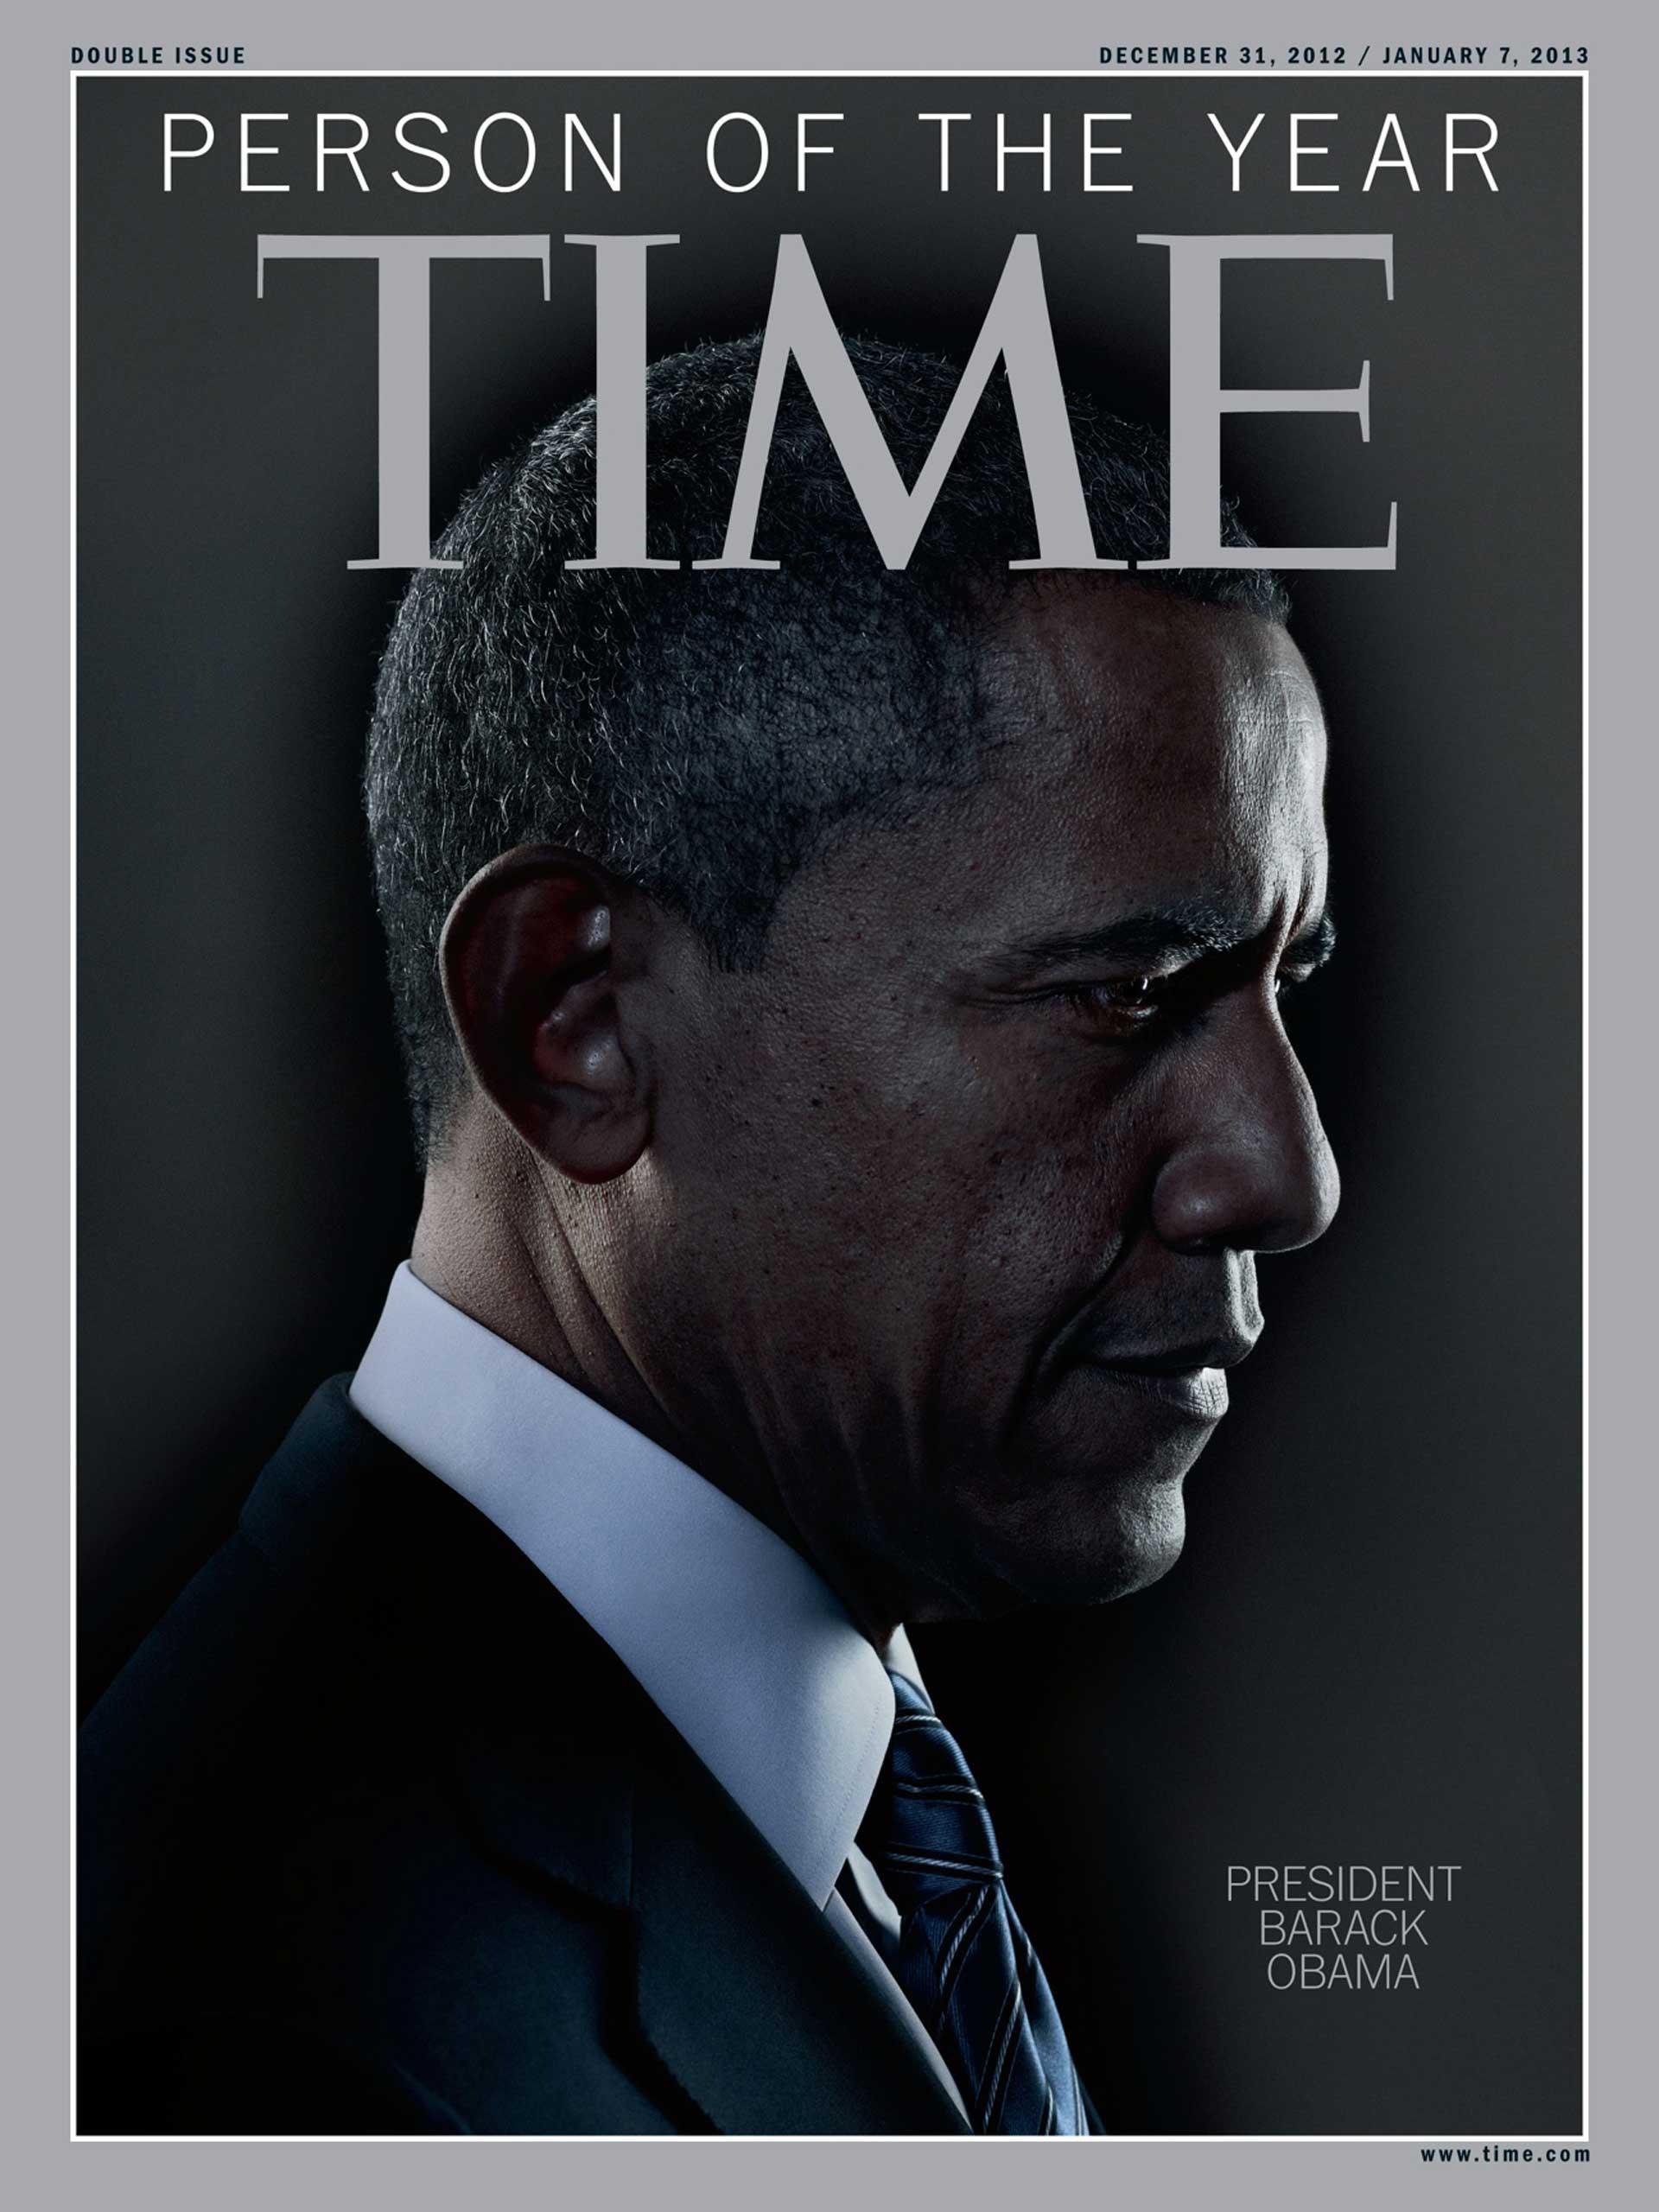 2012: President Barack Obama